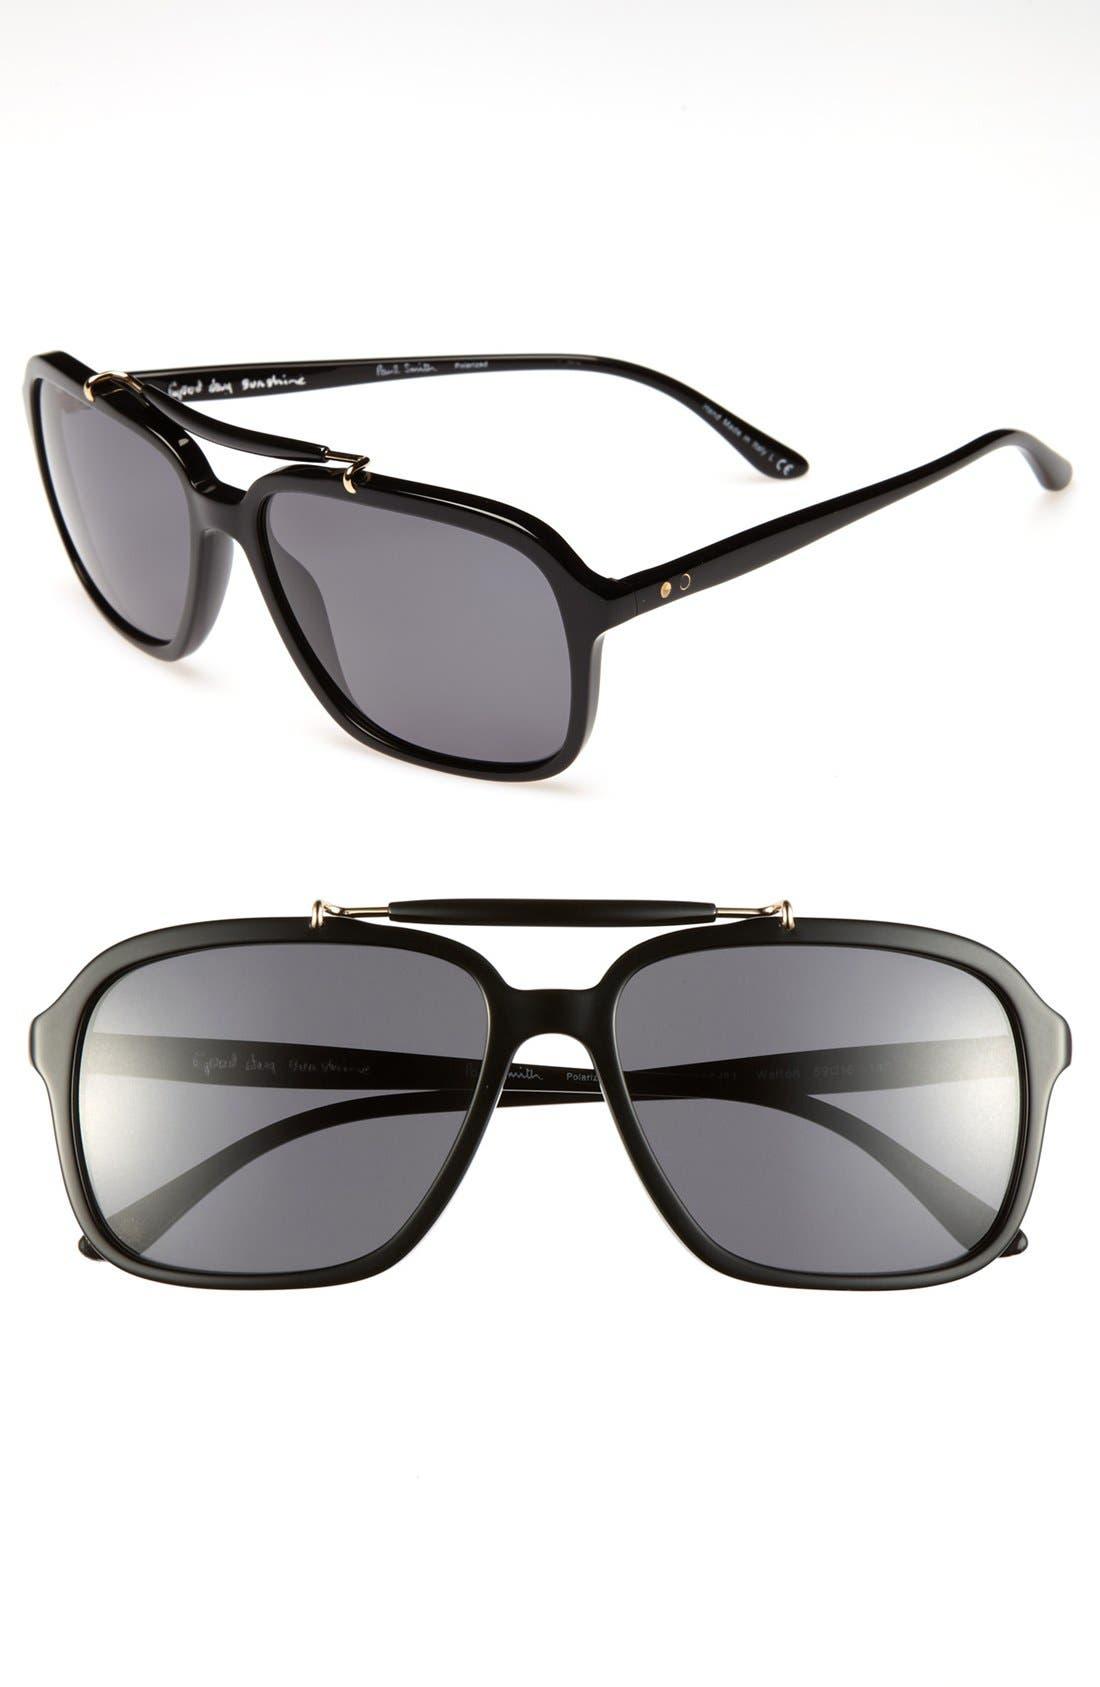 Main Image - Paul Smith 'Walton' 59mm Polarized Sunglasses